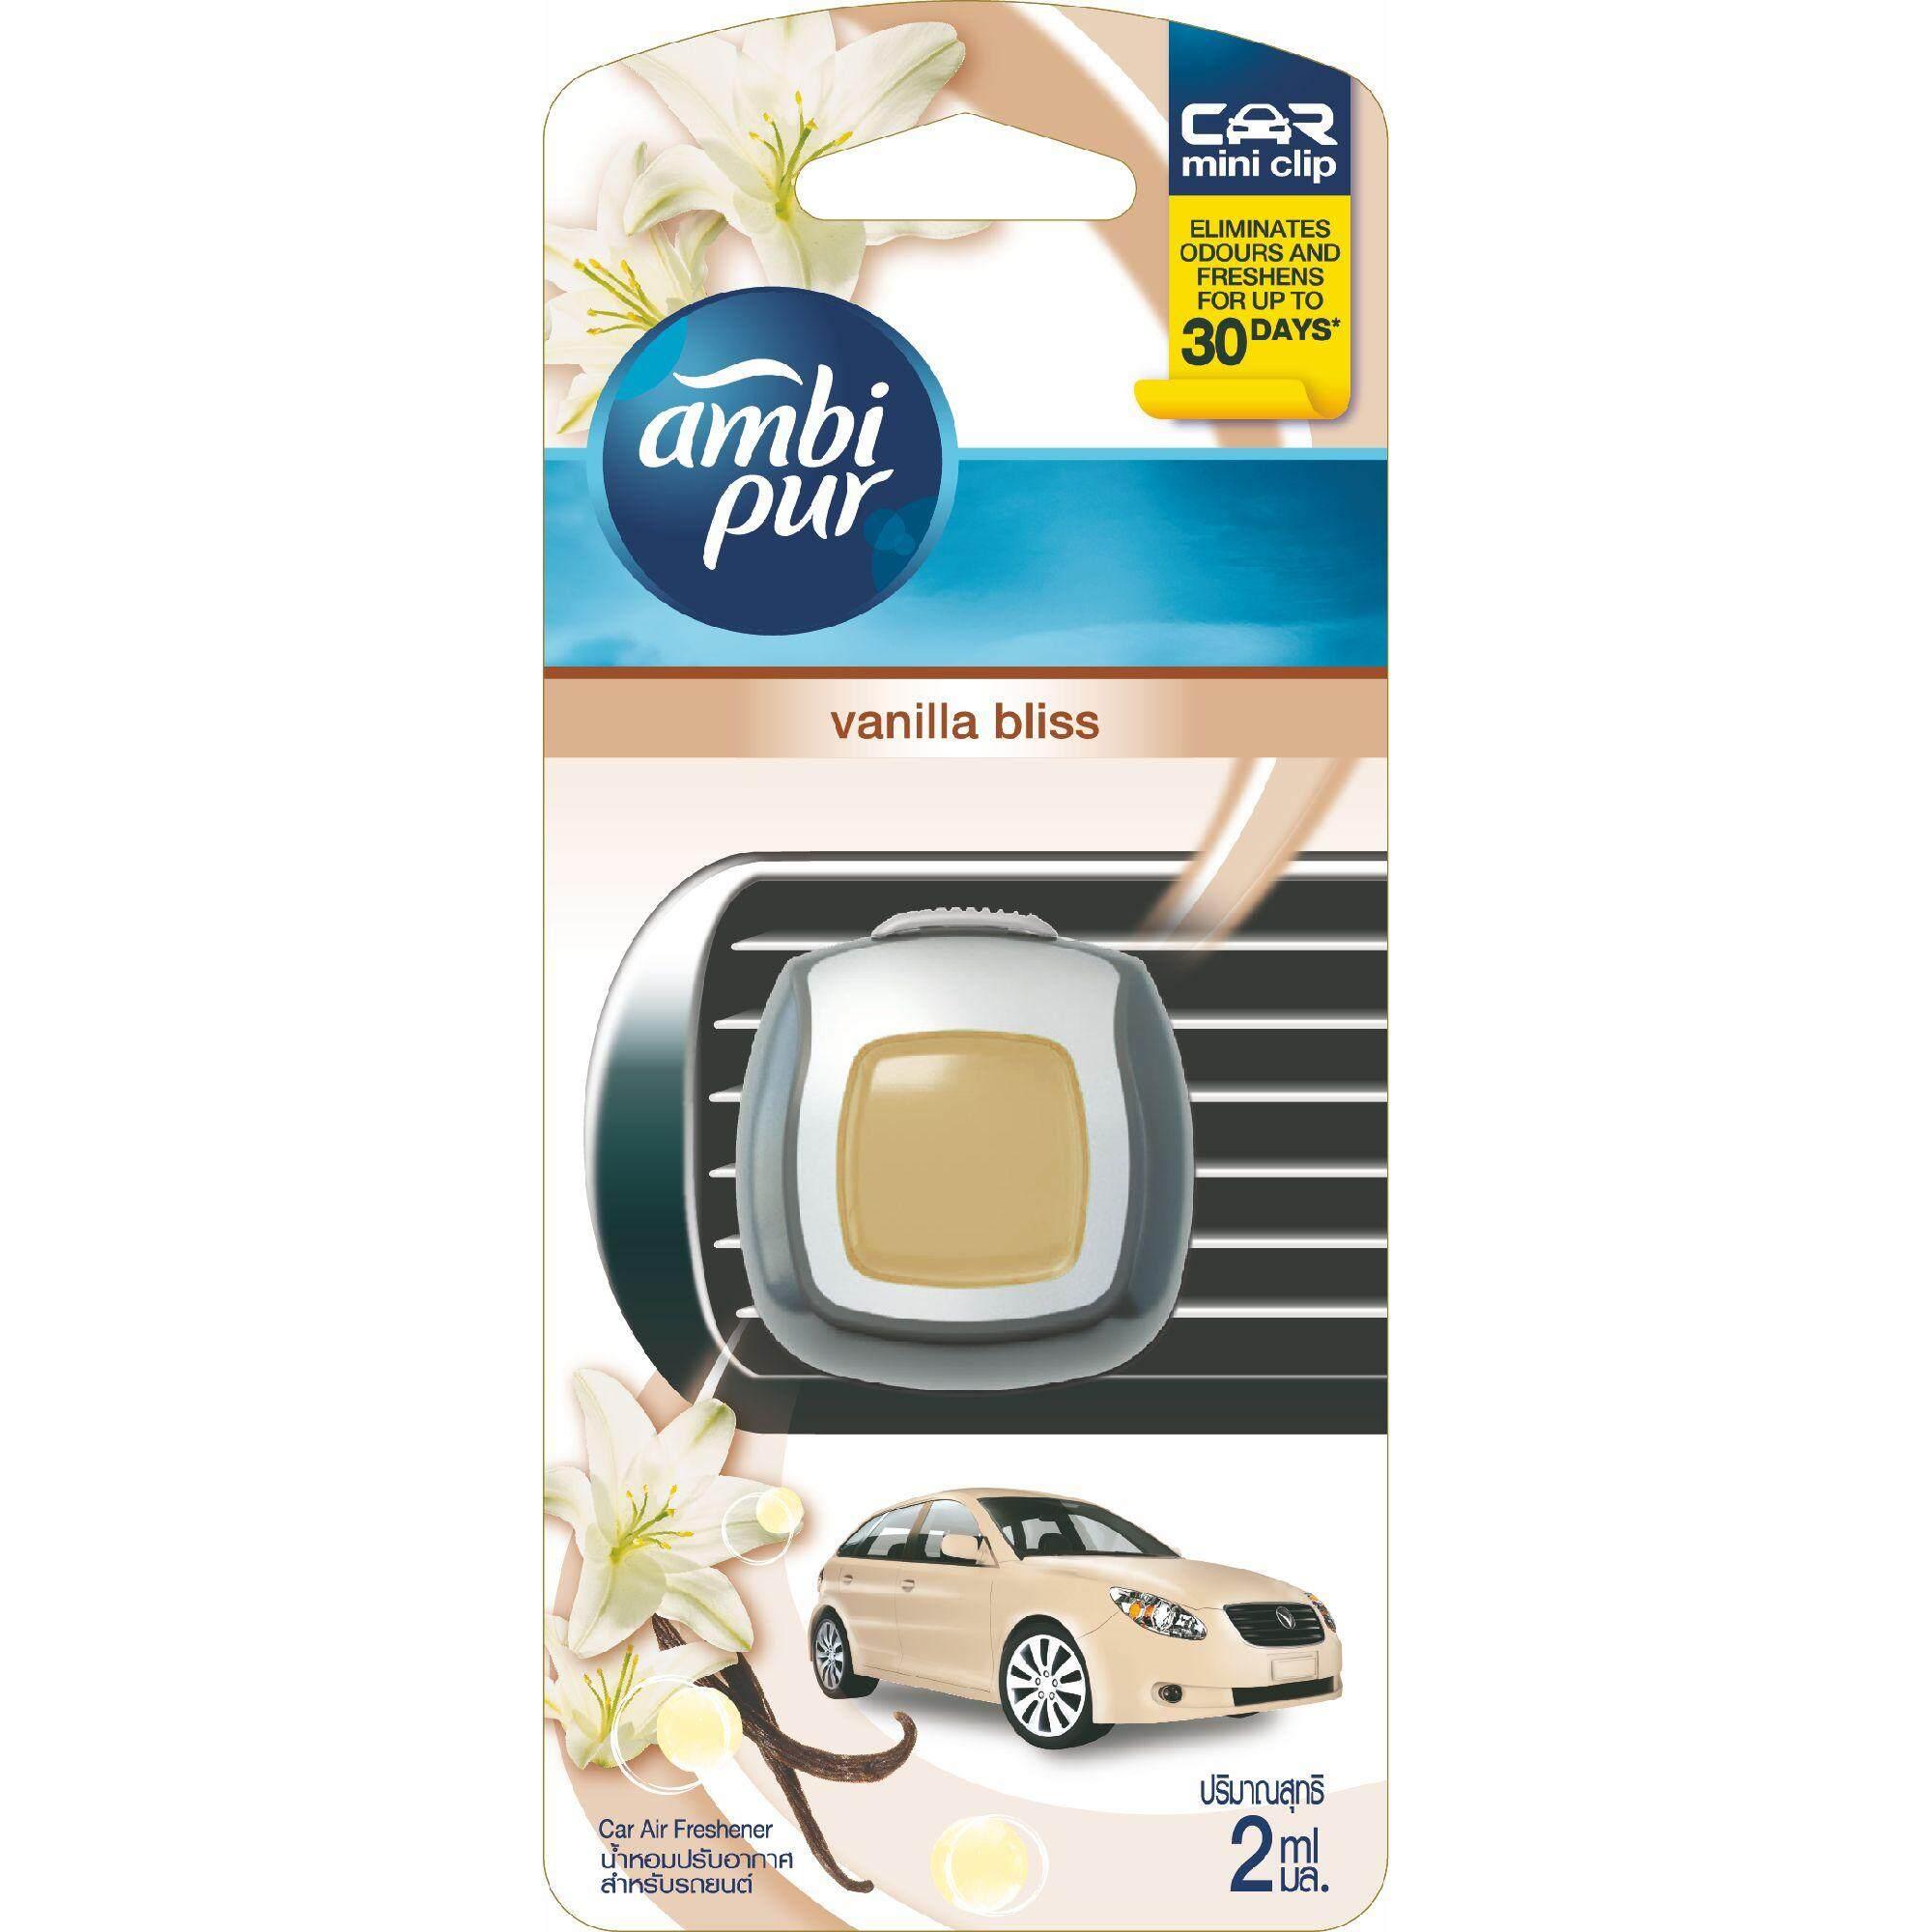 Ambi Pur Mini Clip Car Air Freshener Vanilla Bliss 2ML